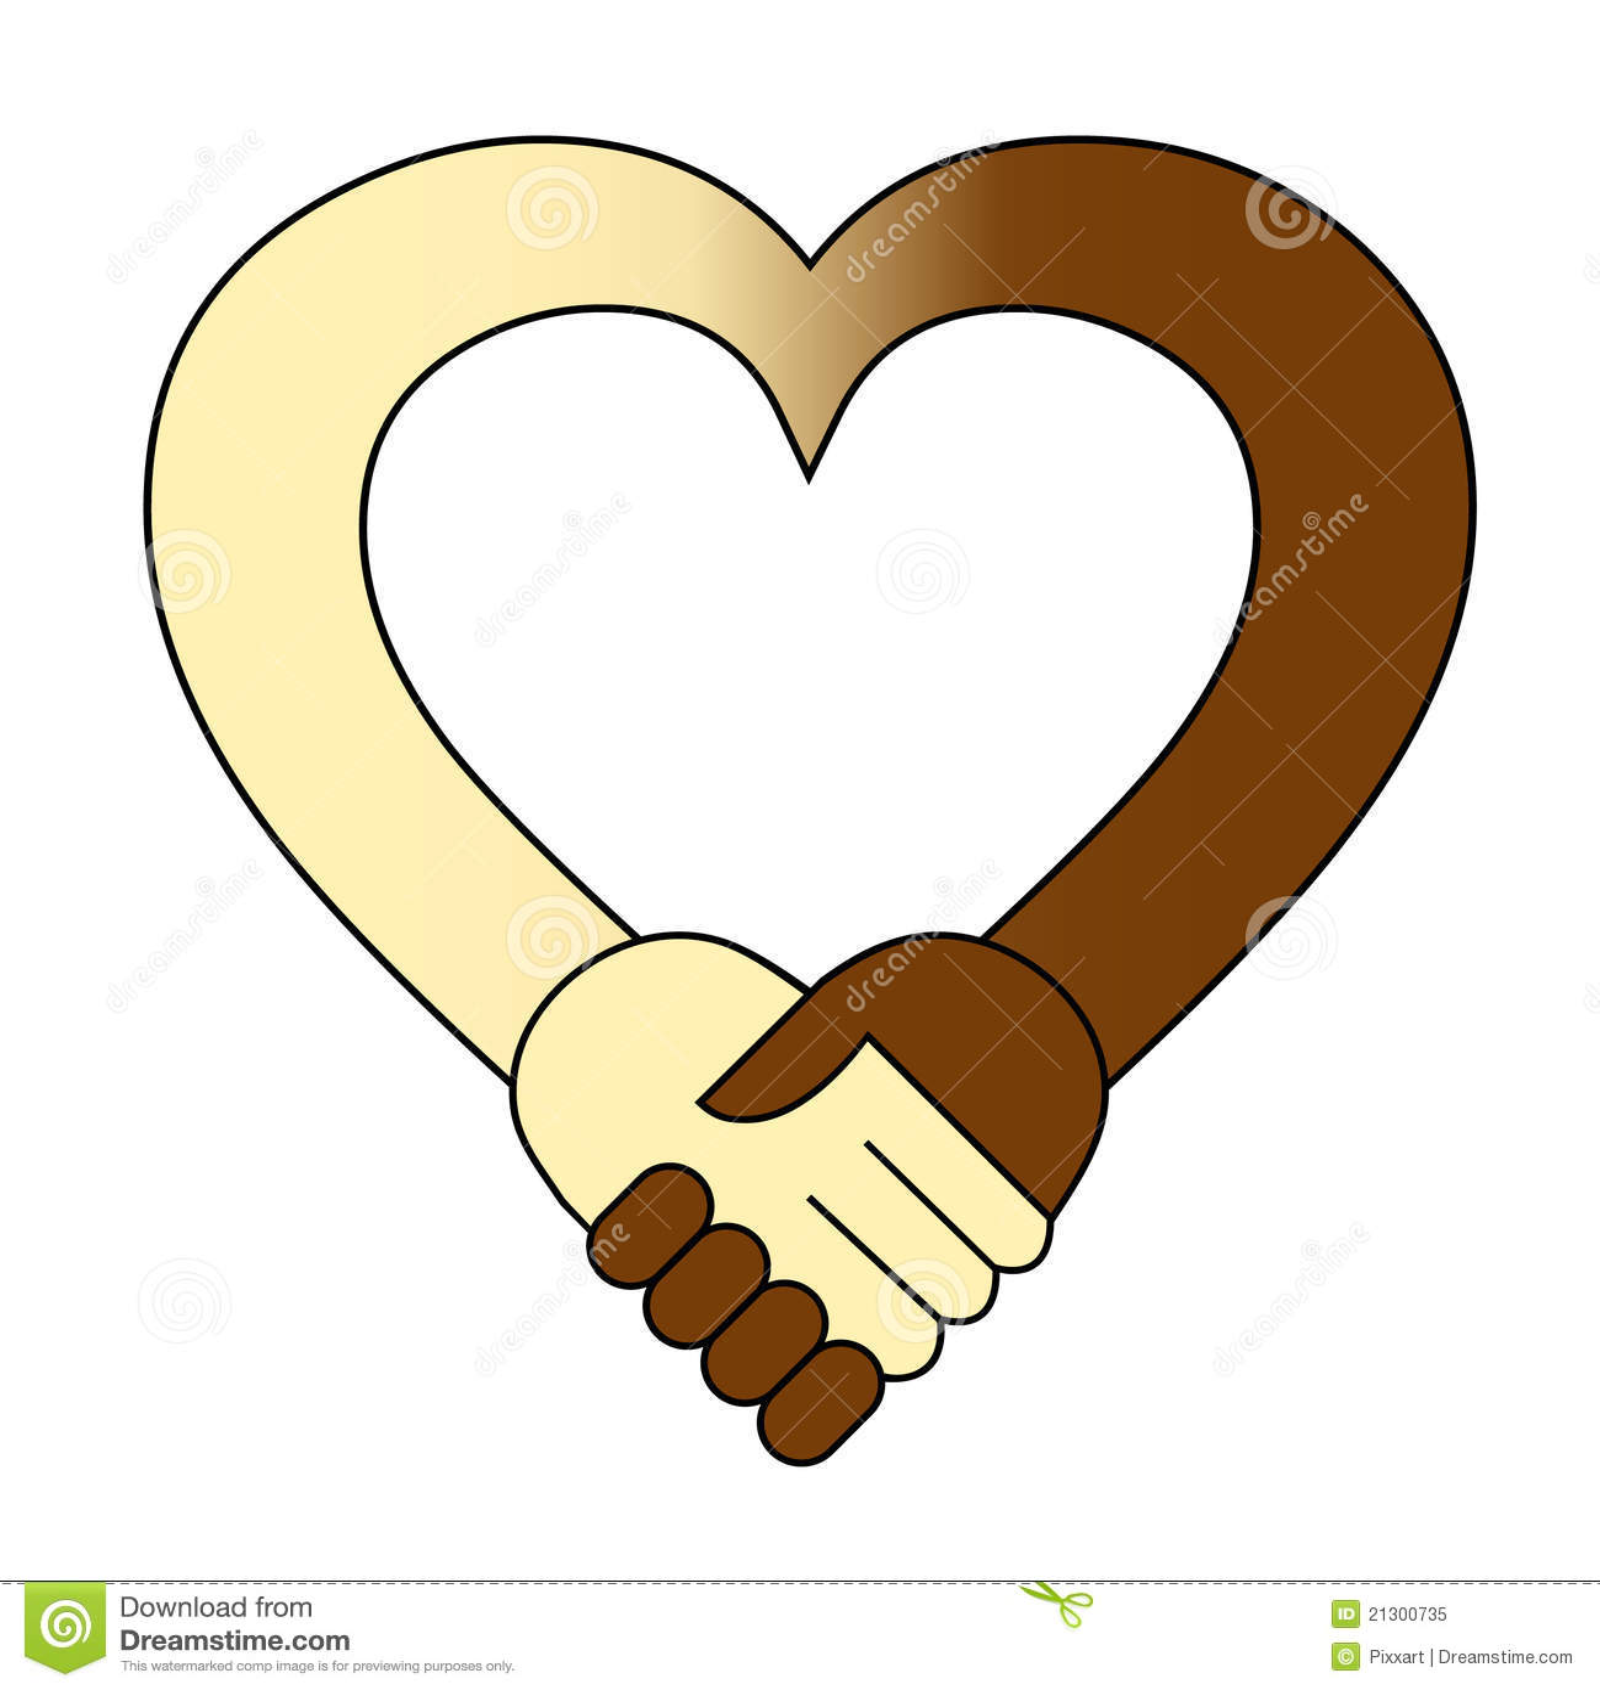 heart hand shake stock vector illustration of friendship